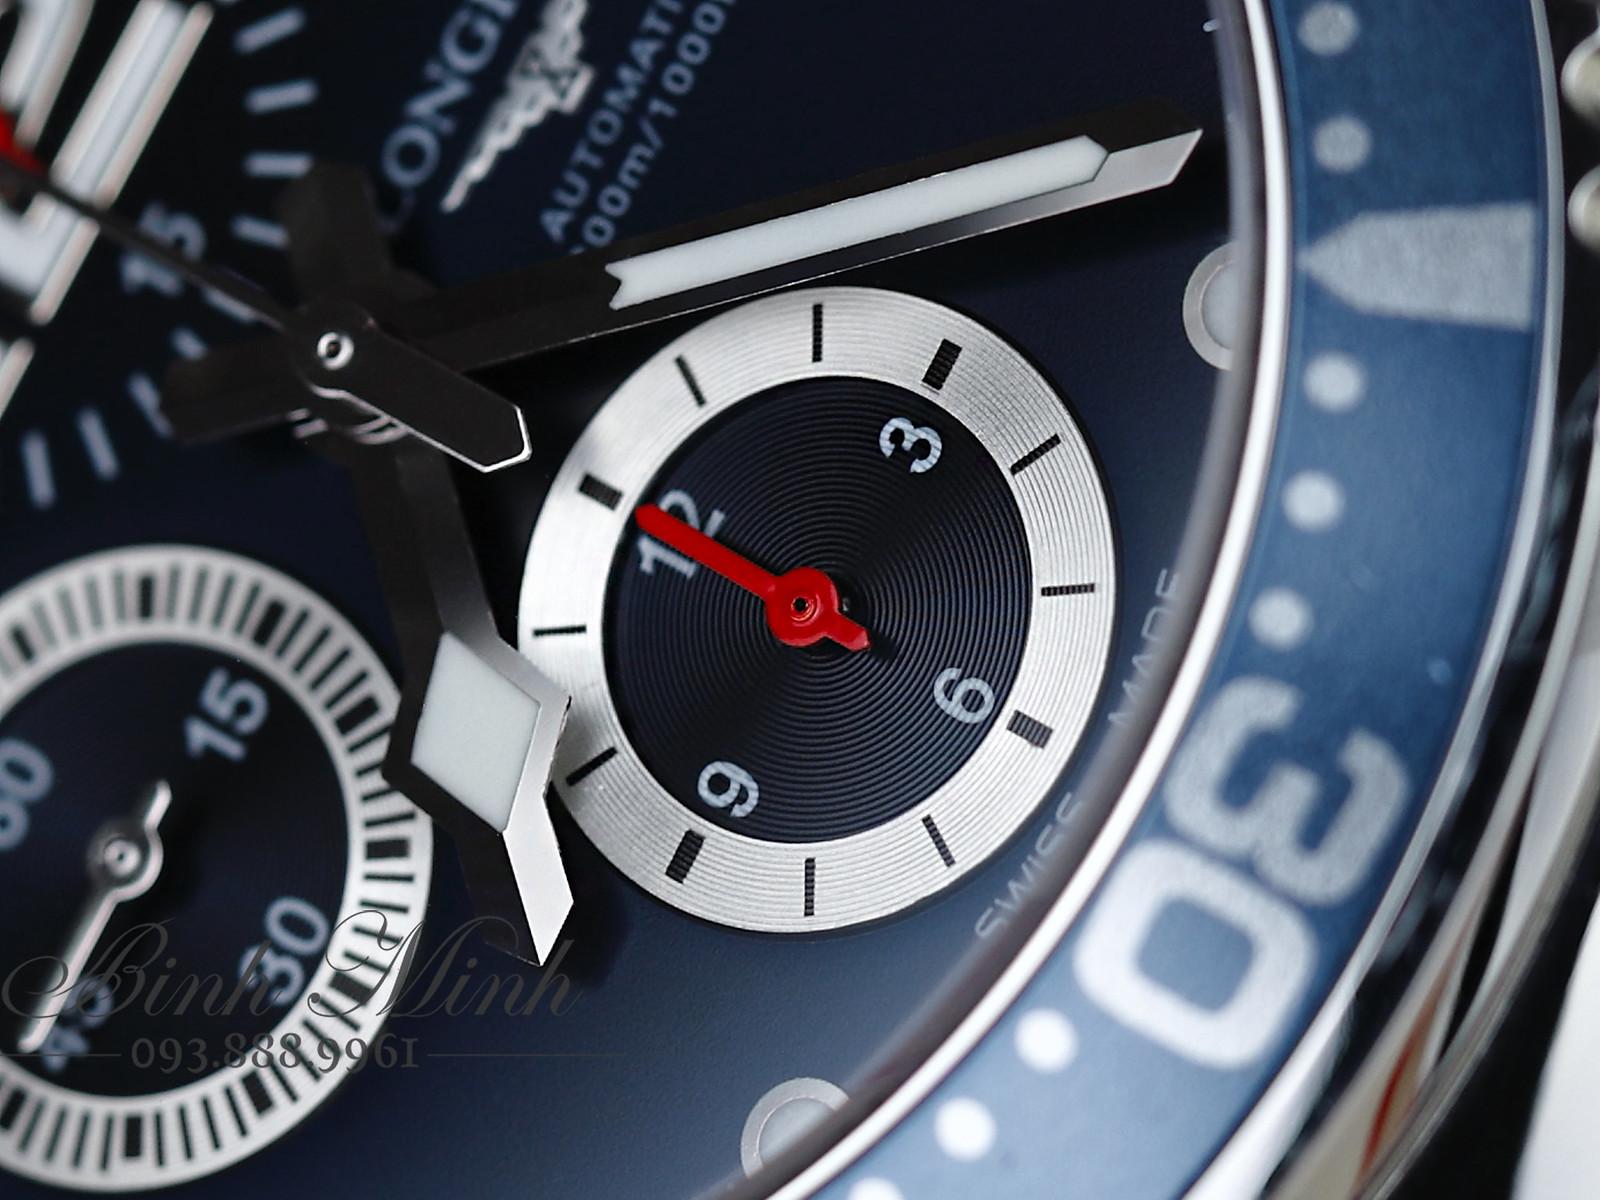 Đồng hồ Longines HydroConquest Chronograph mặt xanh blue máy Automatic, mới 100%, đủ hộp sổ